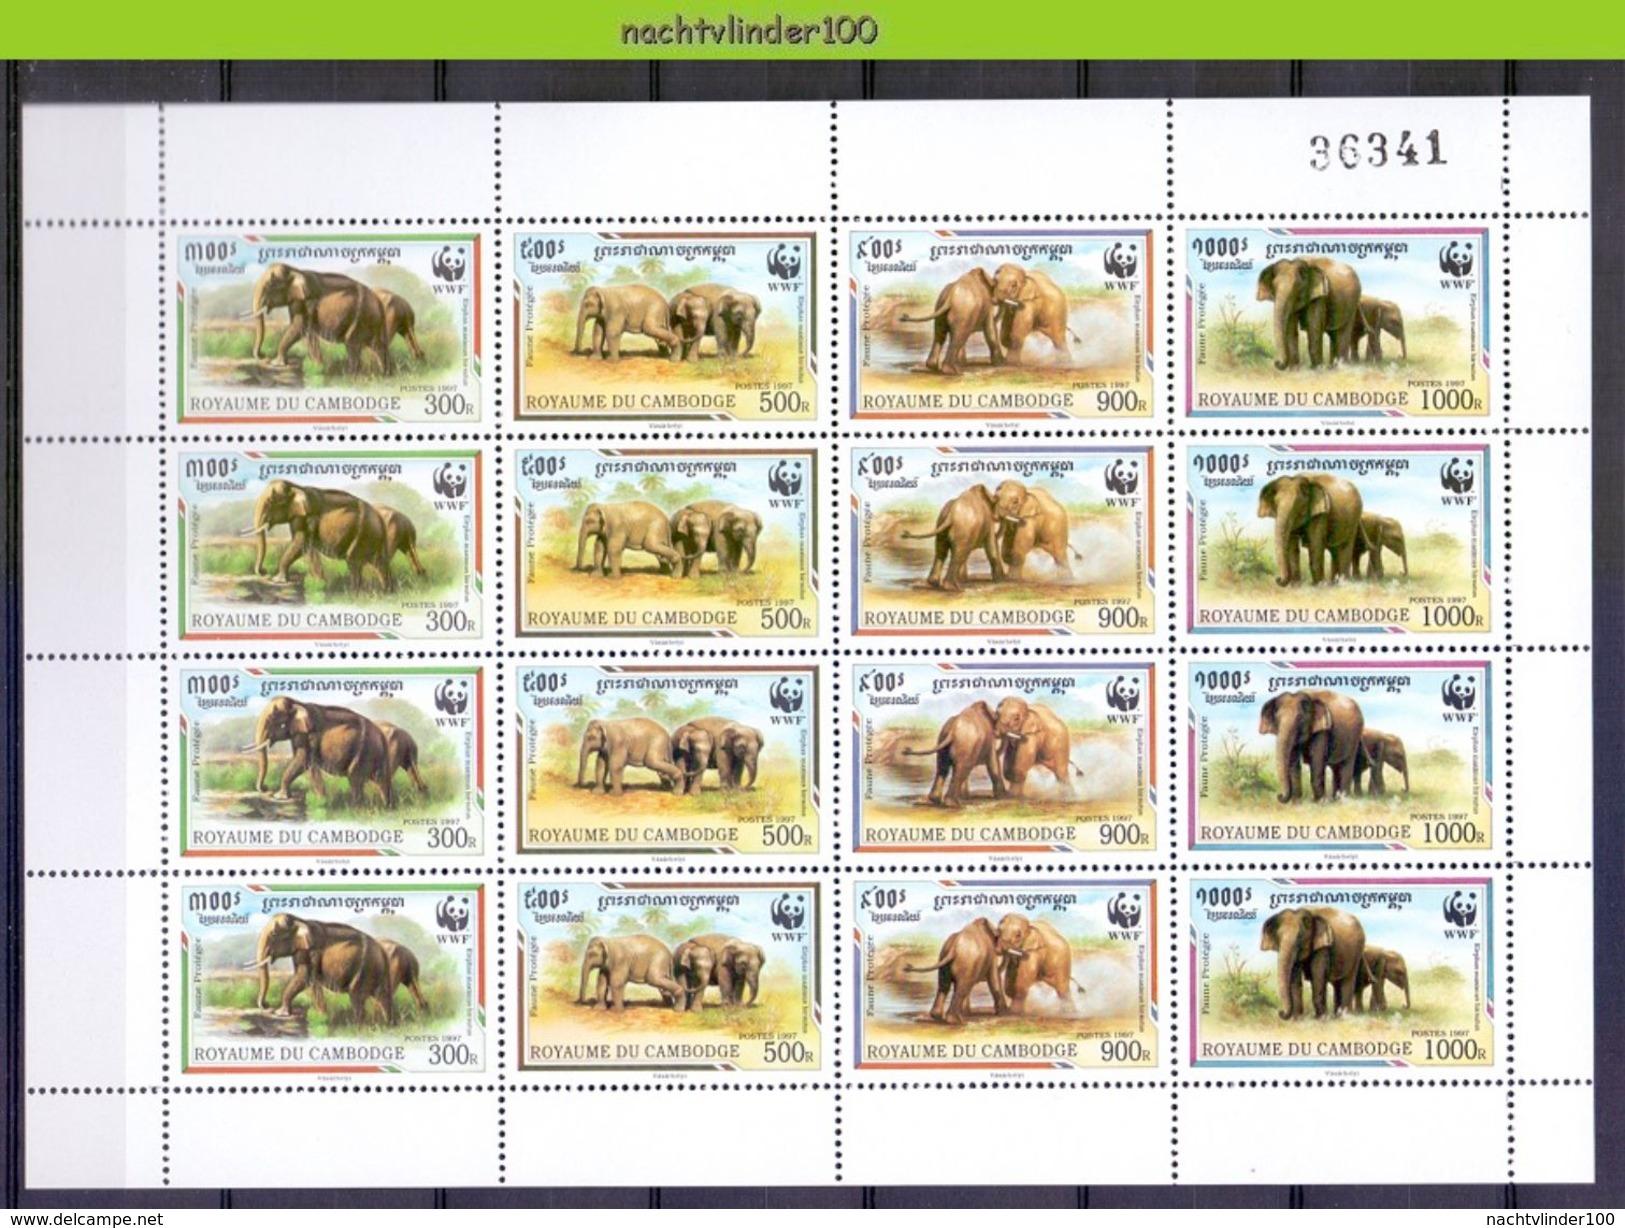 Neh214MSc WWF FAUNA ZOOGDIEREN OLIFANT ELEPHANT MAMMALS ELEFANT CAMBODJA CAMBODGE 1997 PF/MNH - W.W.F.